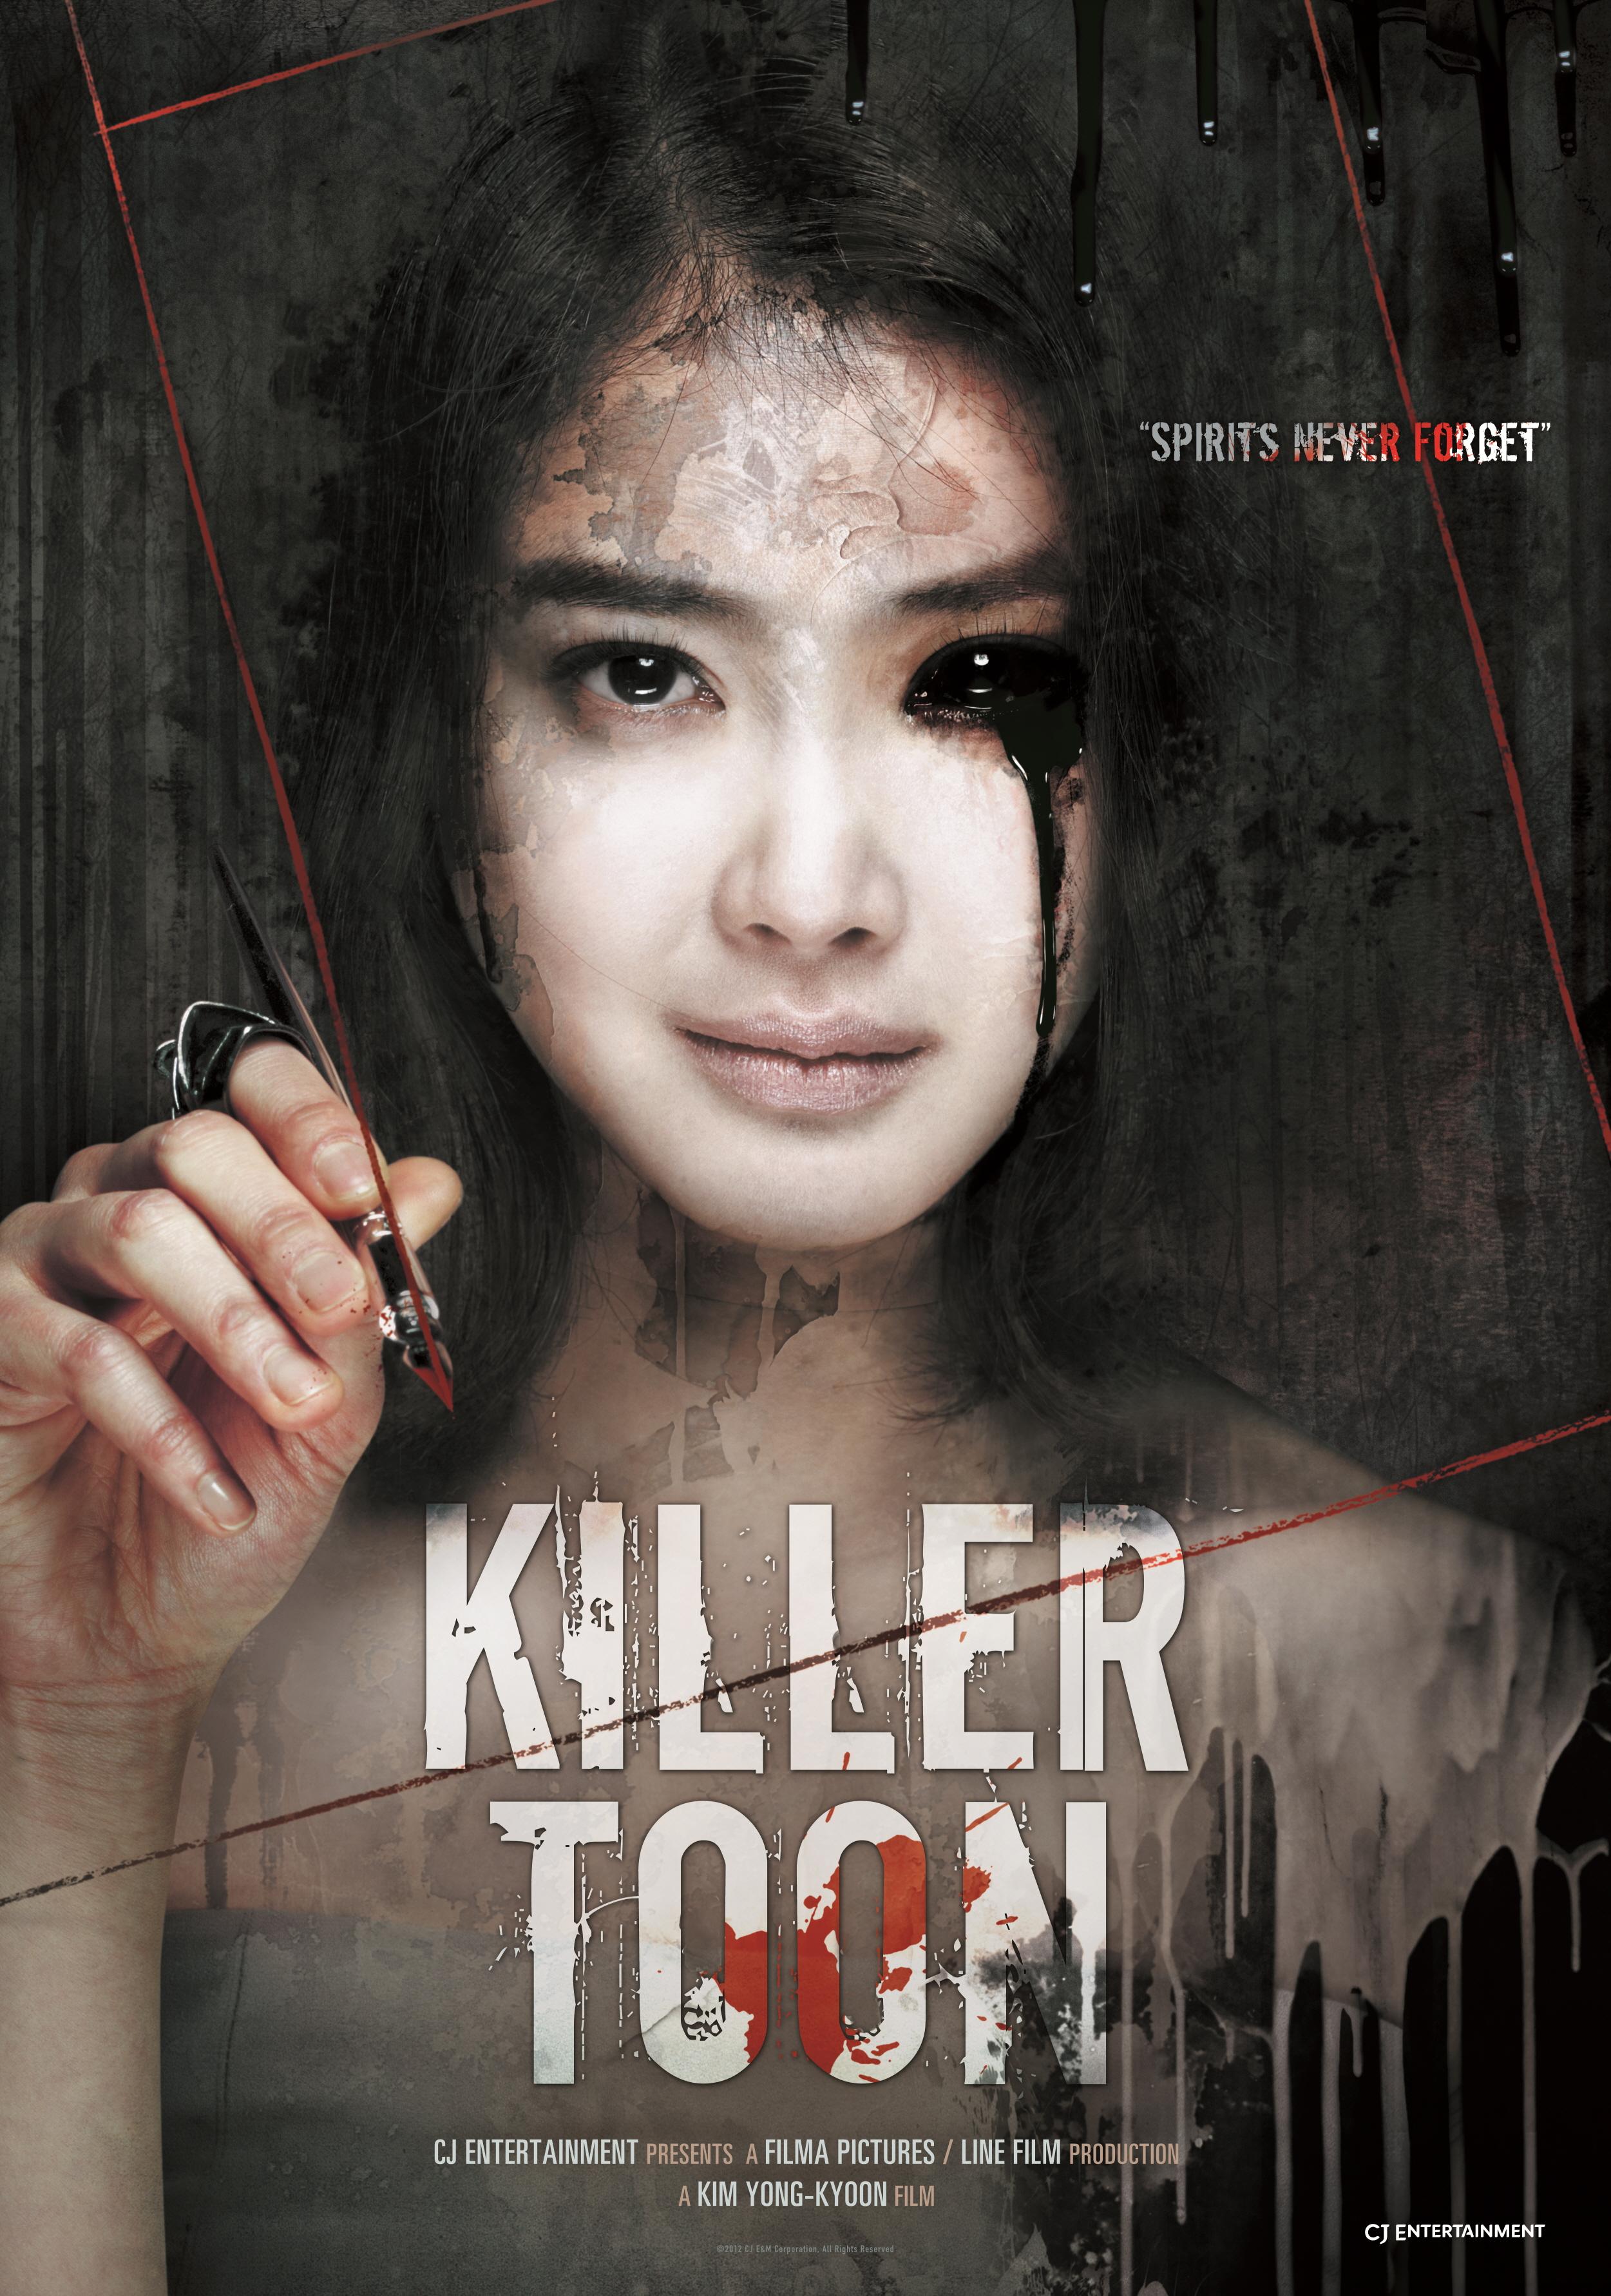 Deo web-toon: Ye-go sal-in (2013) - IMDb